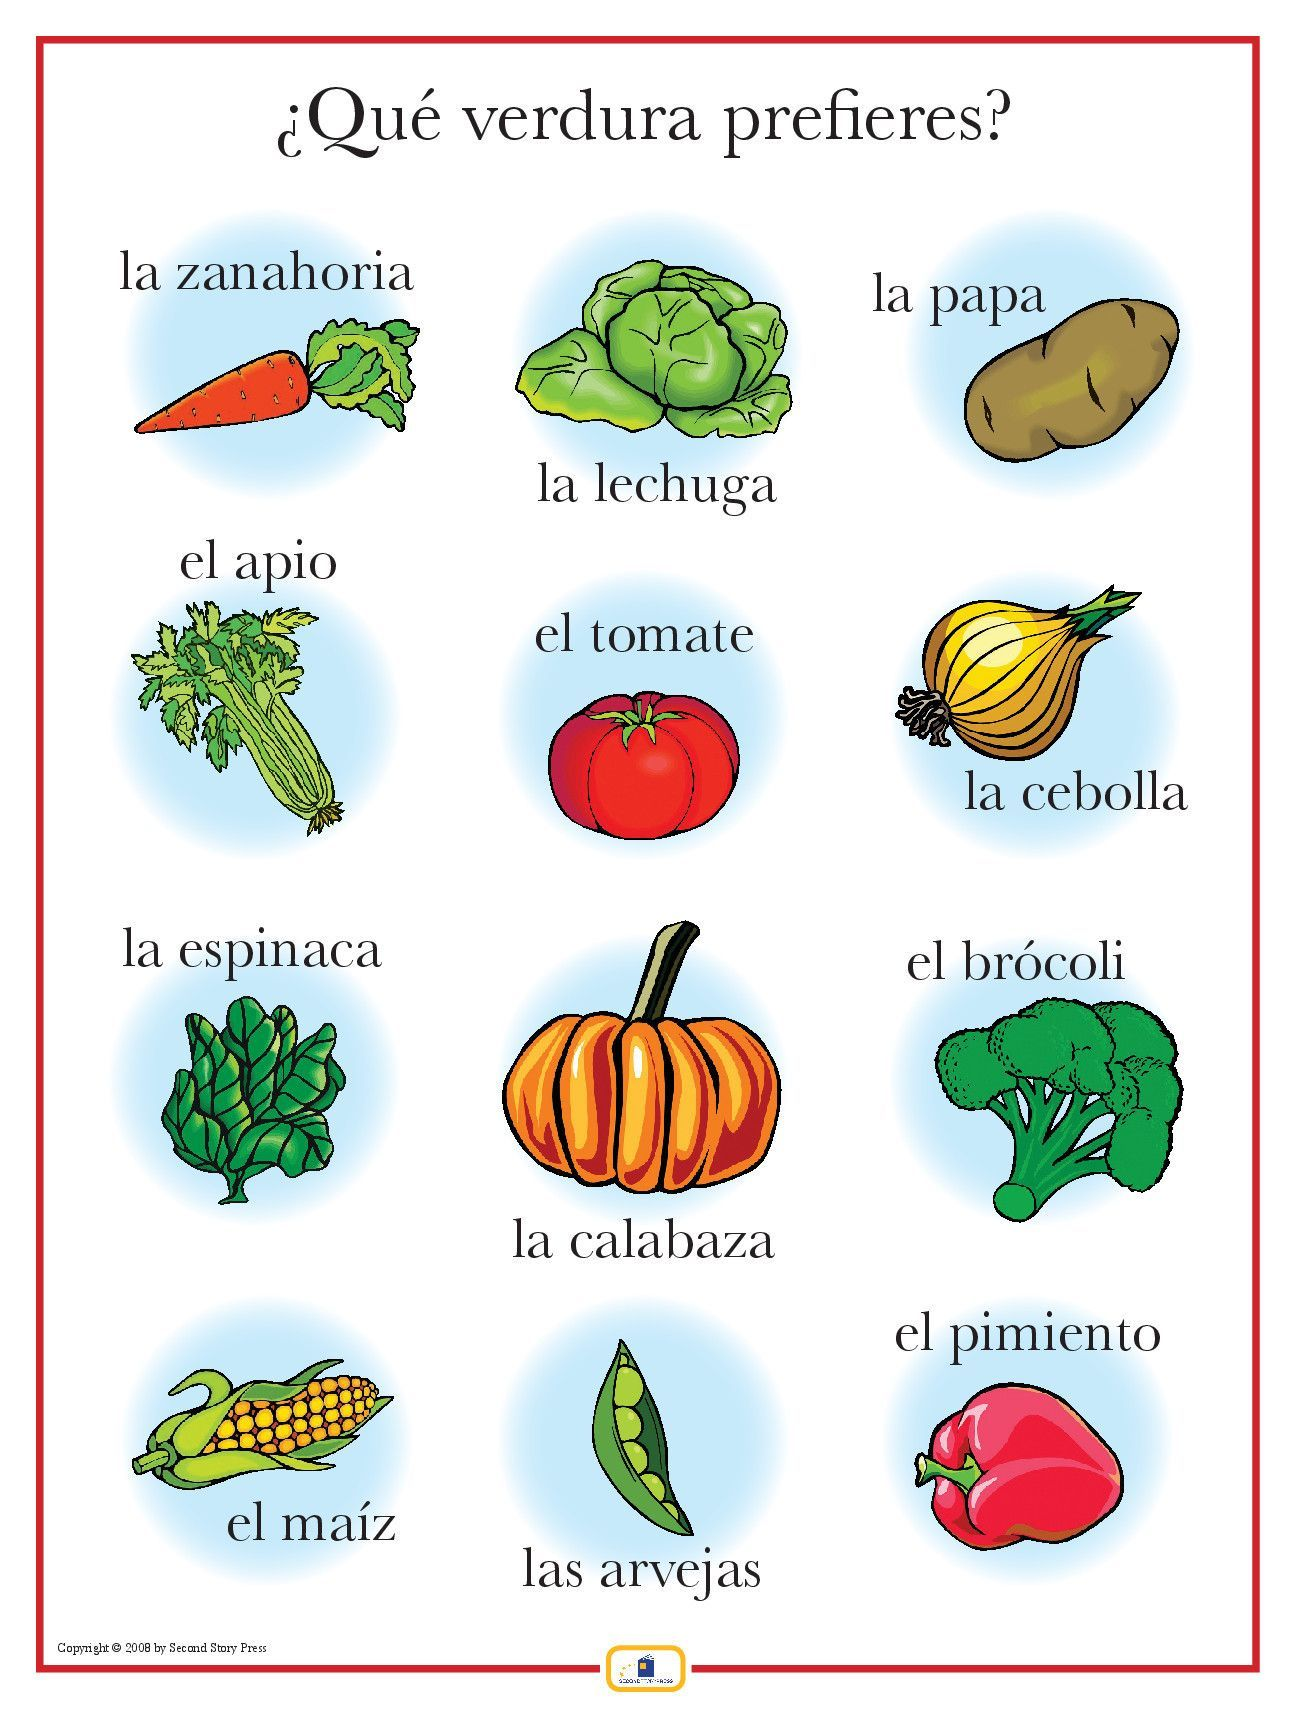 Worksheets Spanish Food Worksheet spanish vegetables poster worksheets and learn poster